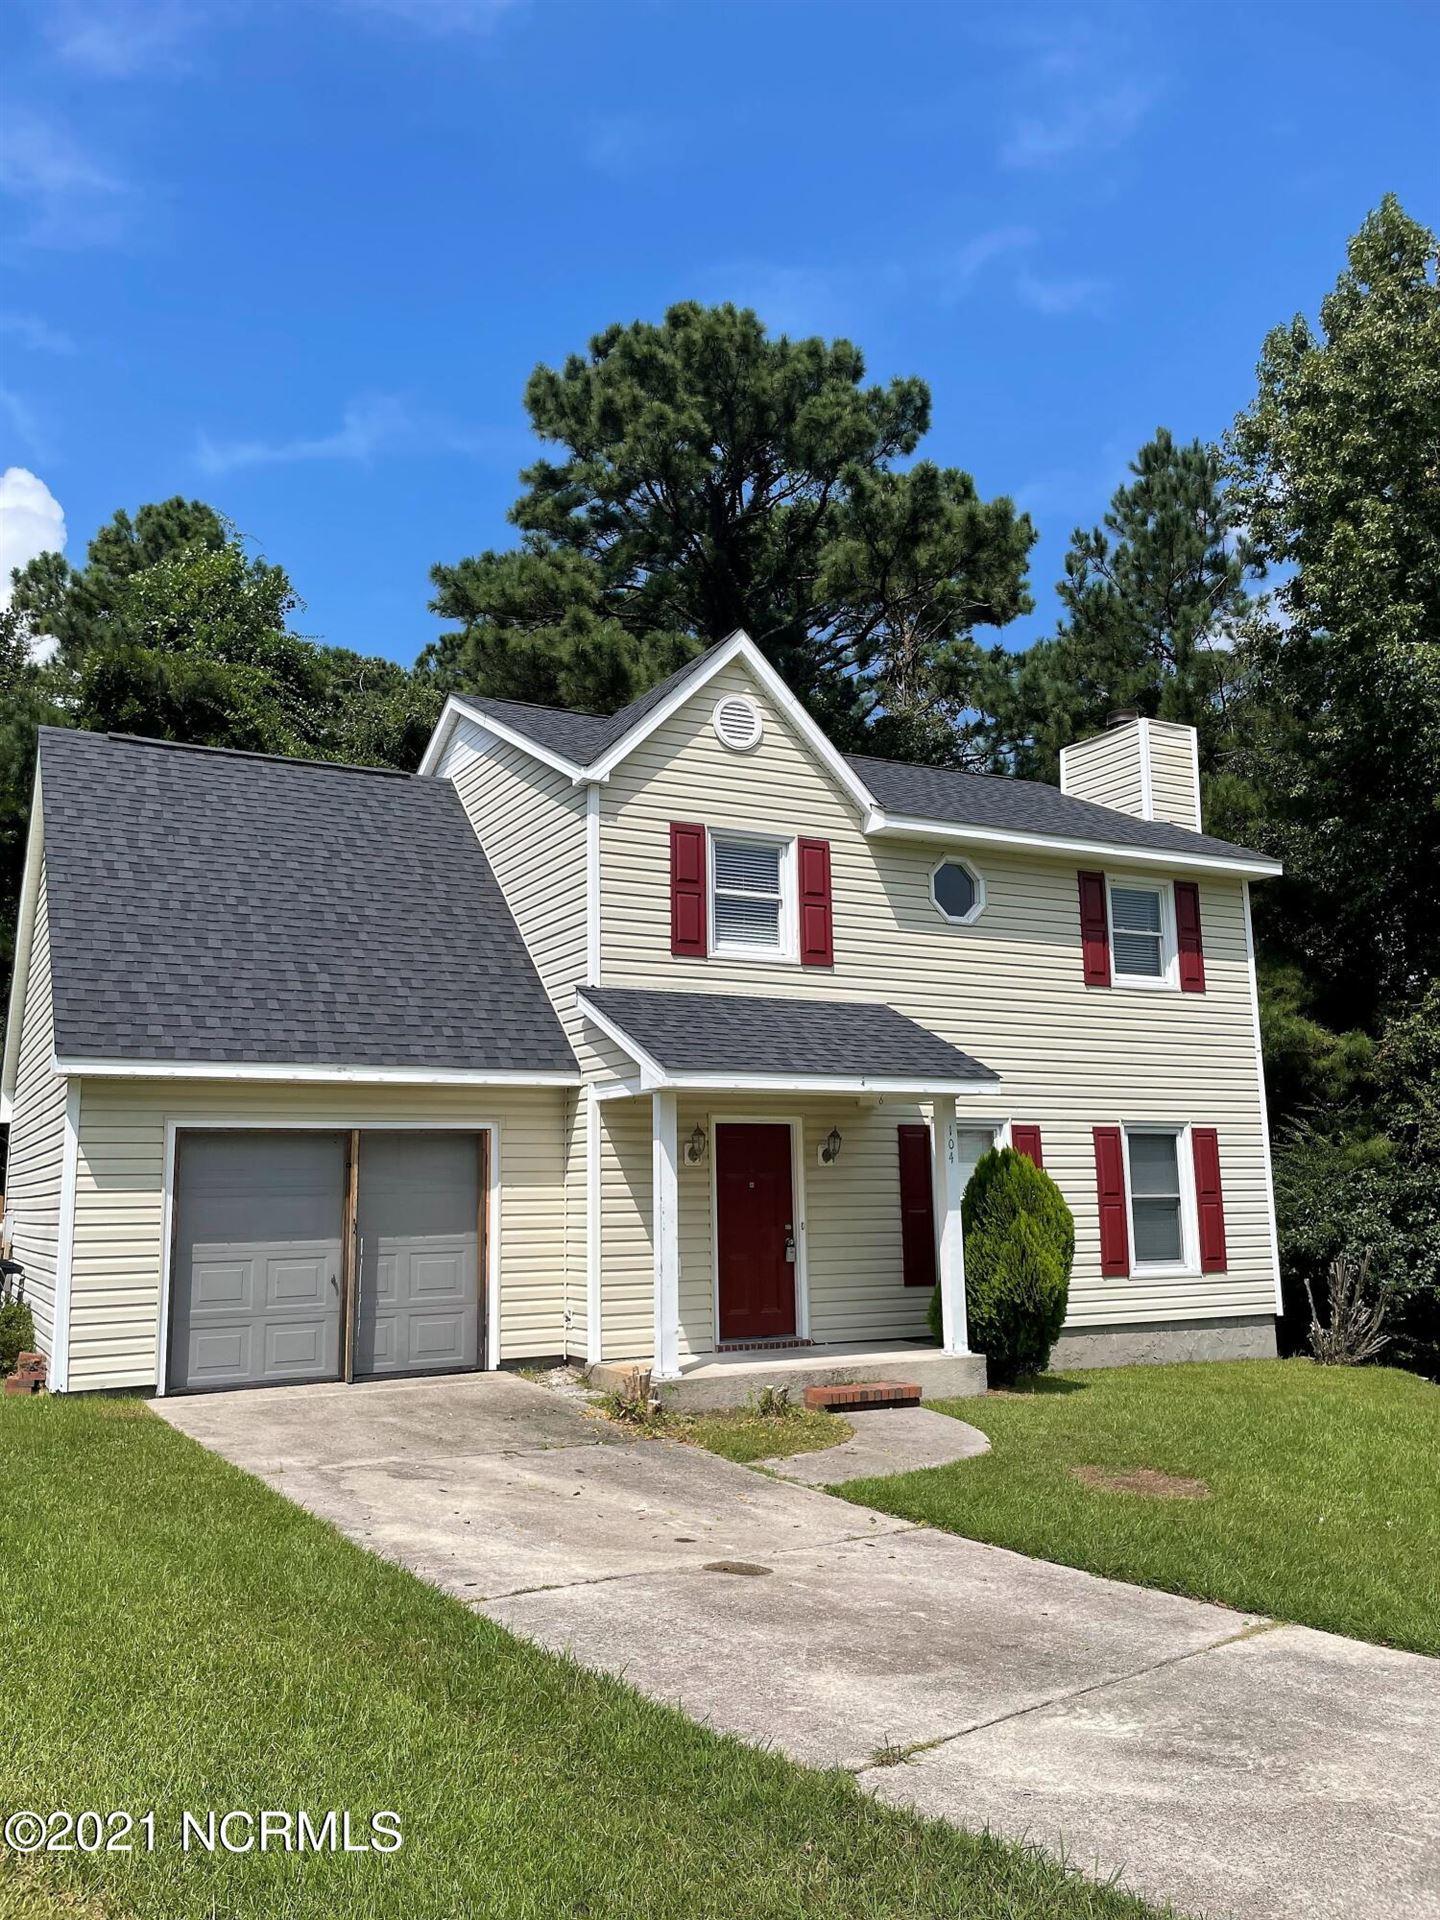 Photo of 104 W Pebble Court, Jacksonville, NC 28546 (MLS # 100290047)